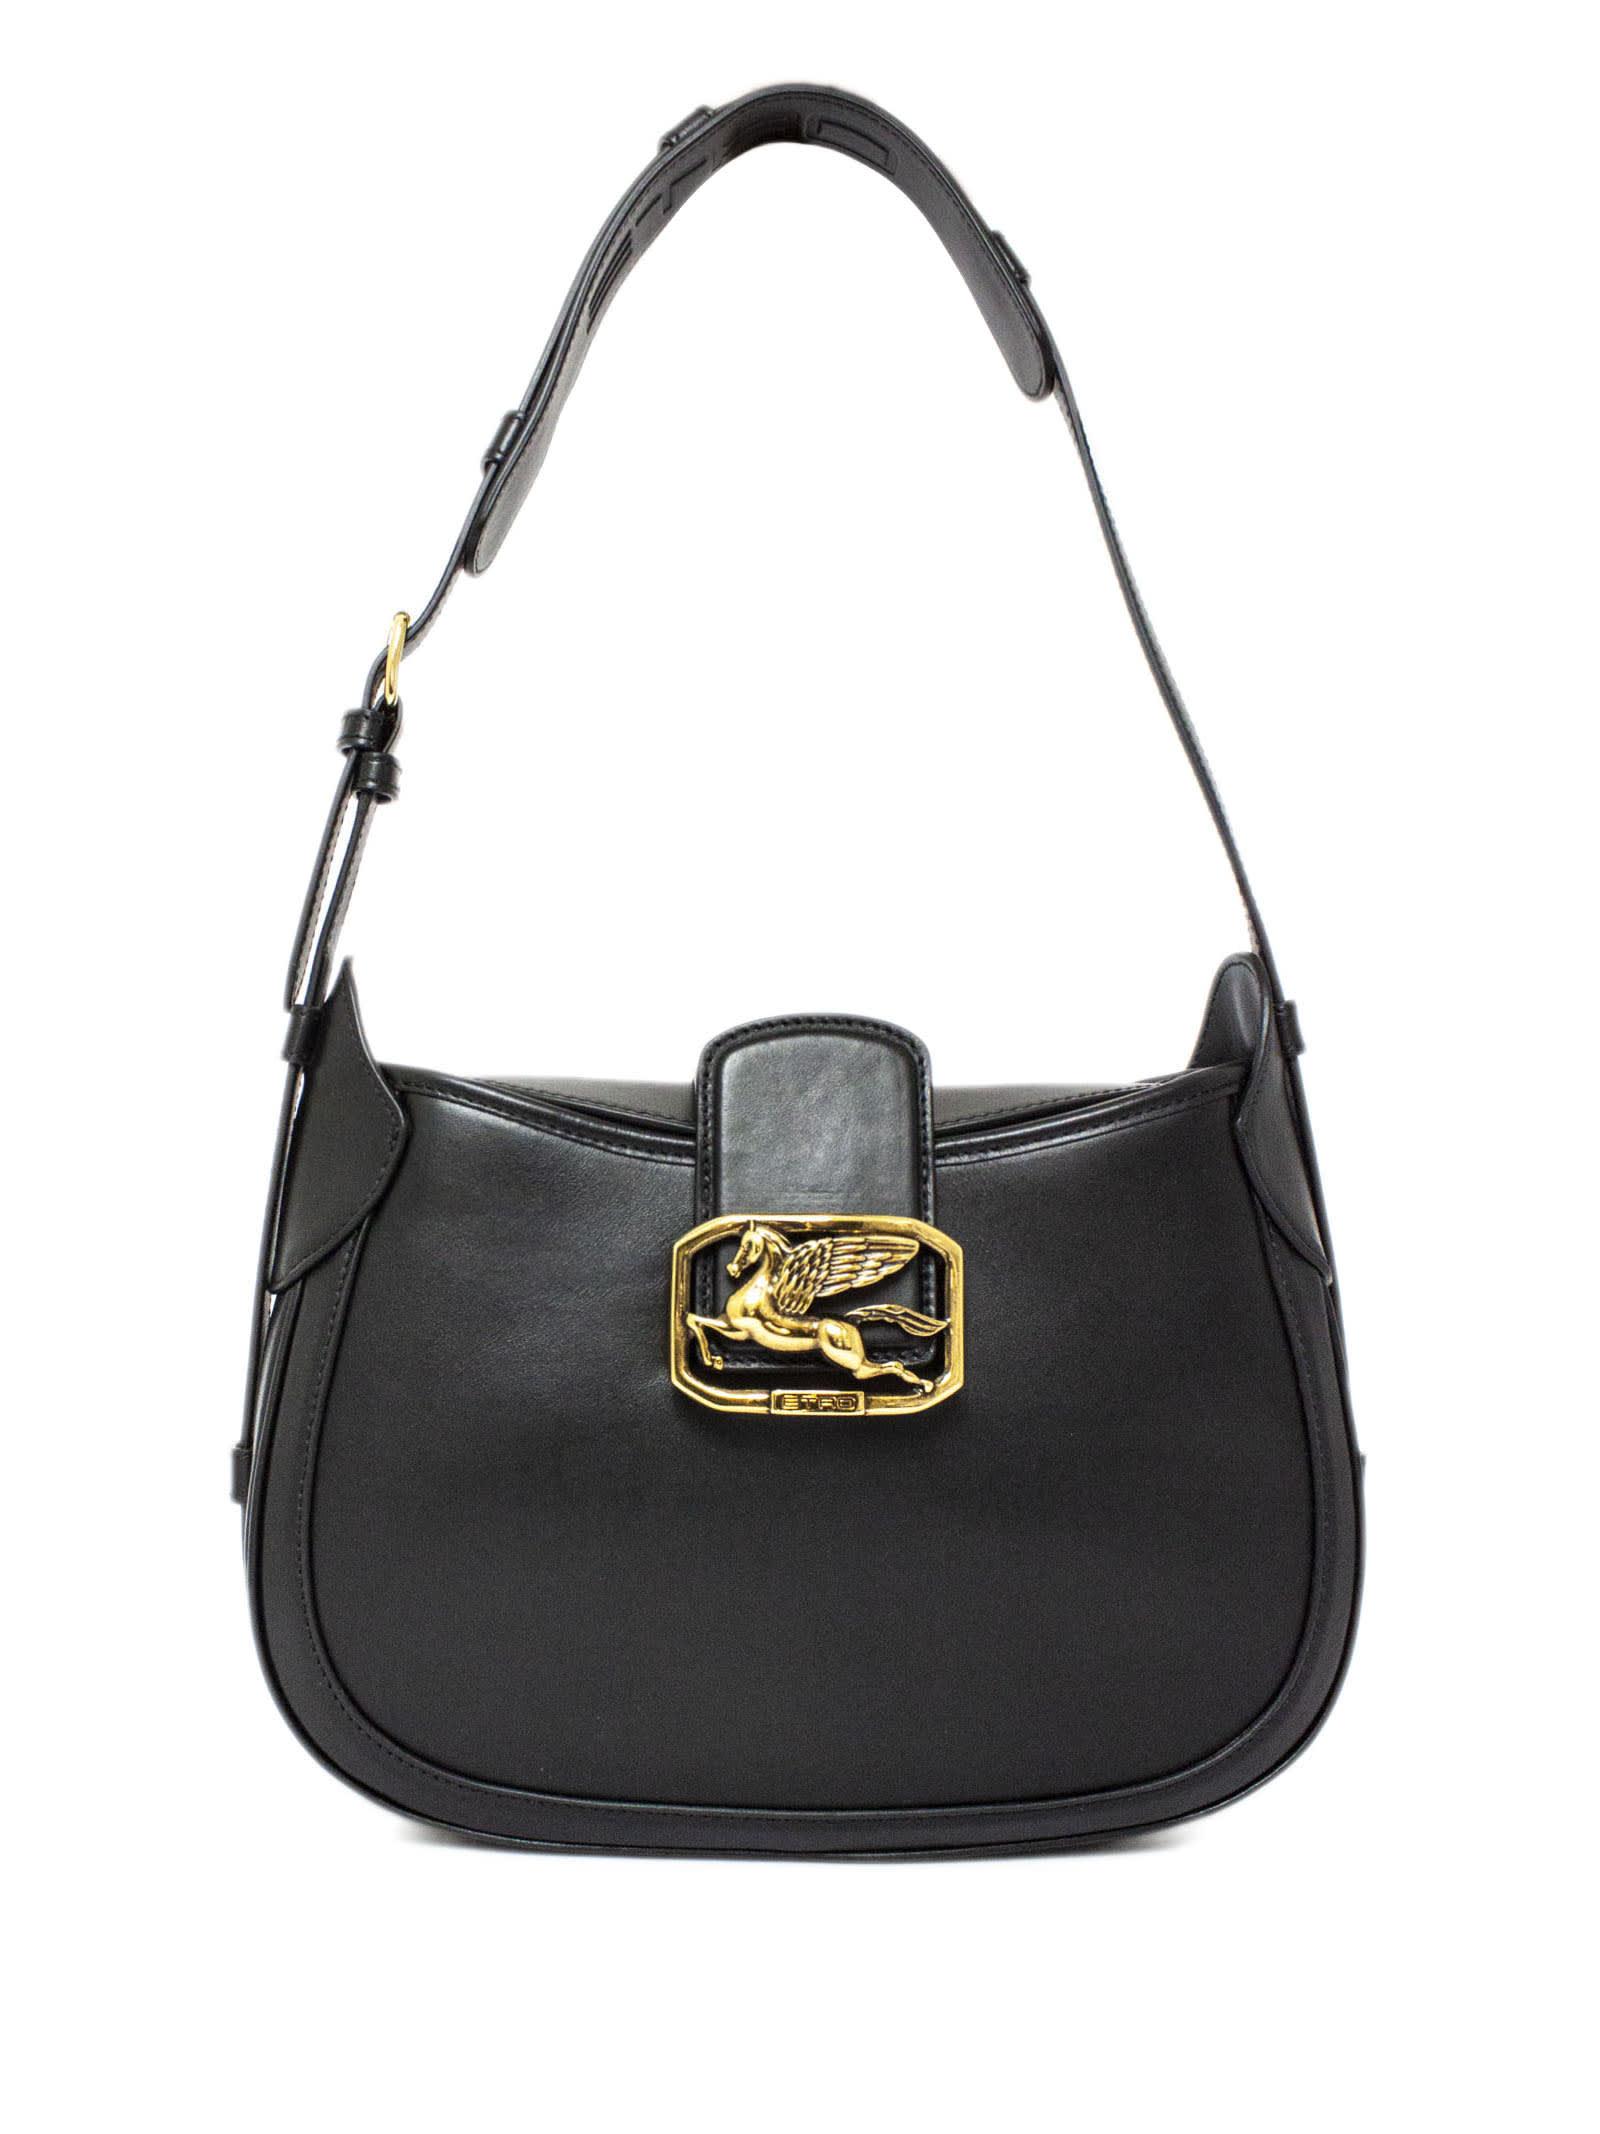 Etro Pegaso Bag In Black Leather